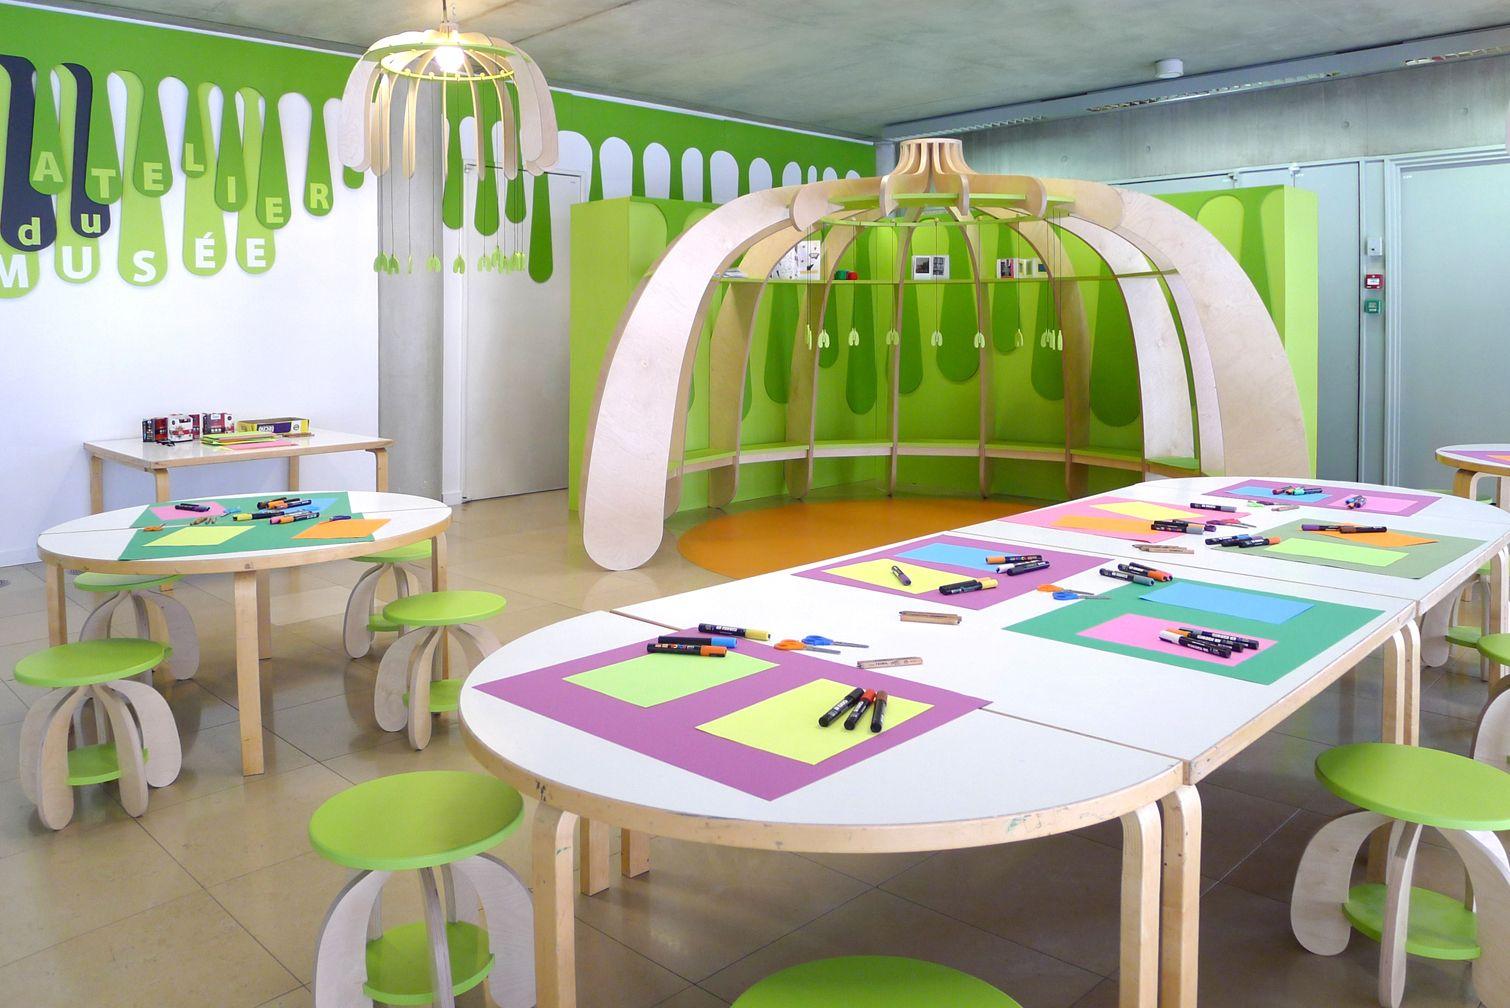 Petite Pousse Children S Workshop Space Design Matali Crasset